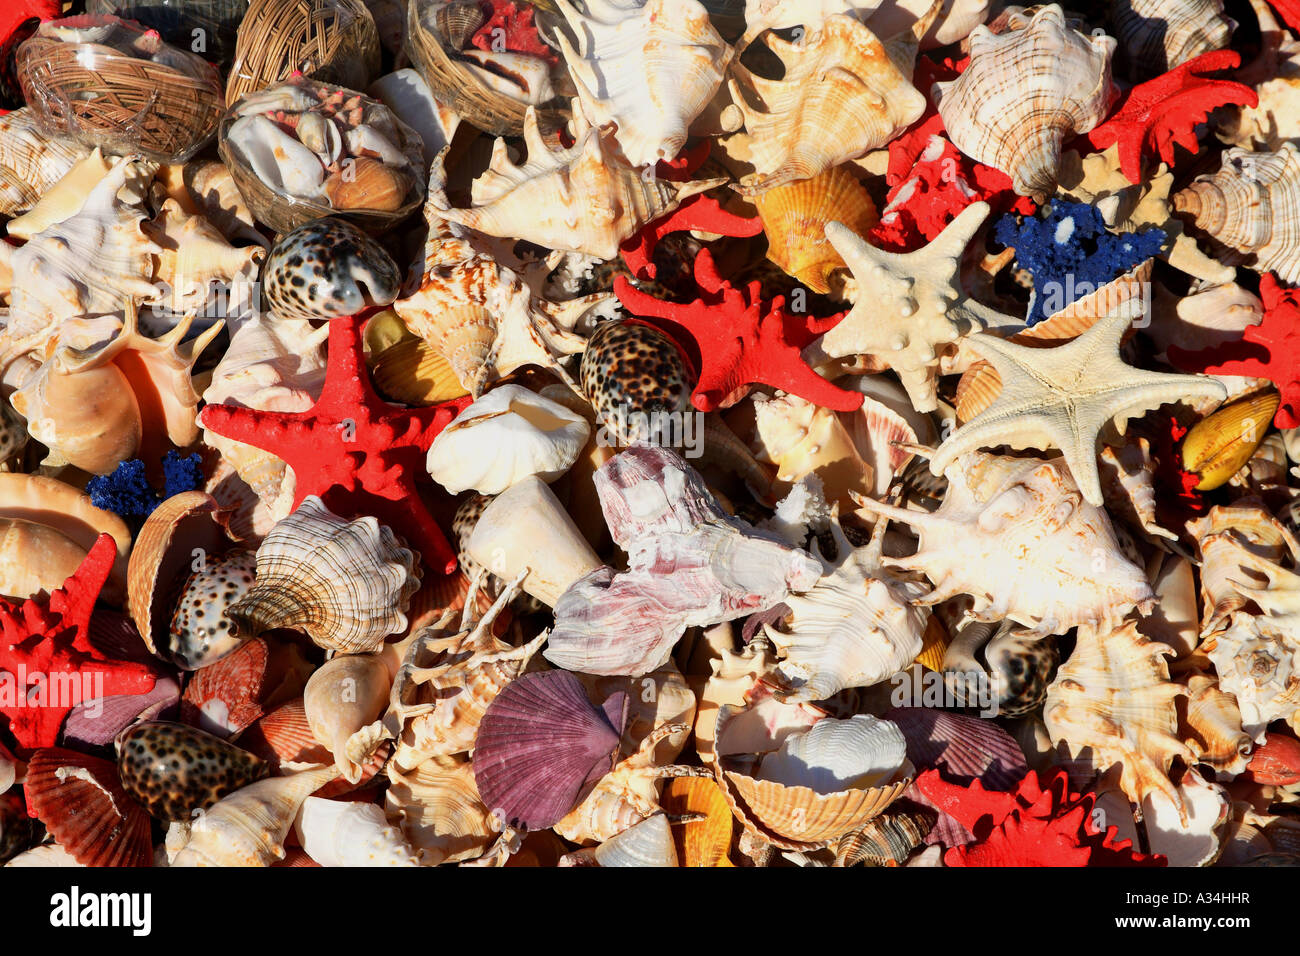 selling of sea animals Stock Photo